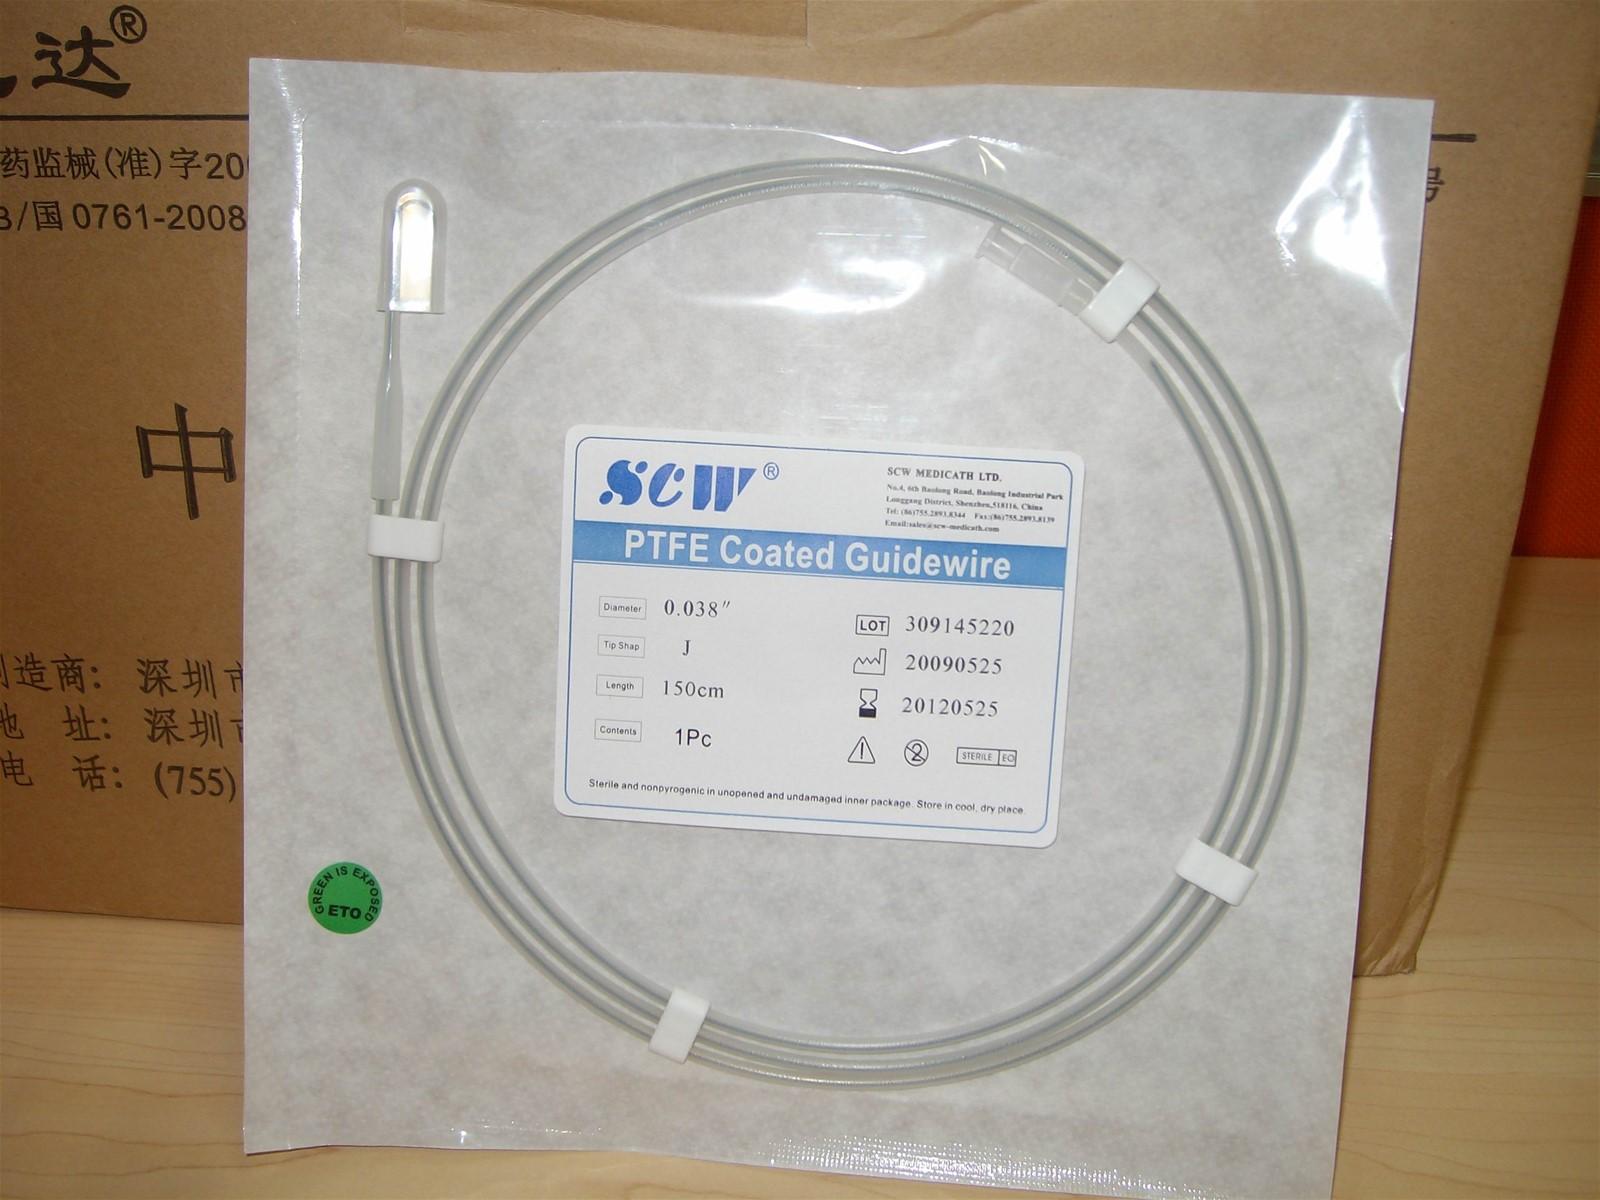 Multilayer Ptfe Wire Center Guidesquot Kit You Get 149 Identifier Labels Plus A Circuitbreaker Great Ideas Wiring Standart Installations Rh Winkeel Info 16 Awg Teflon